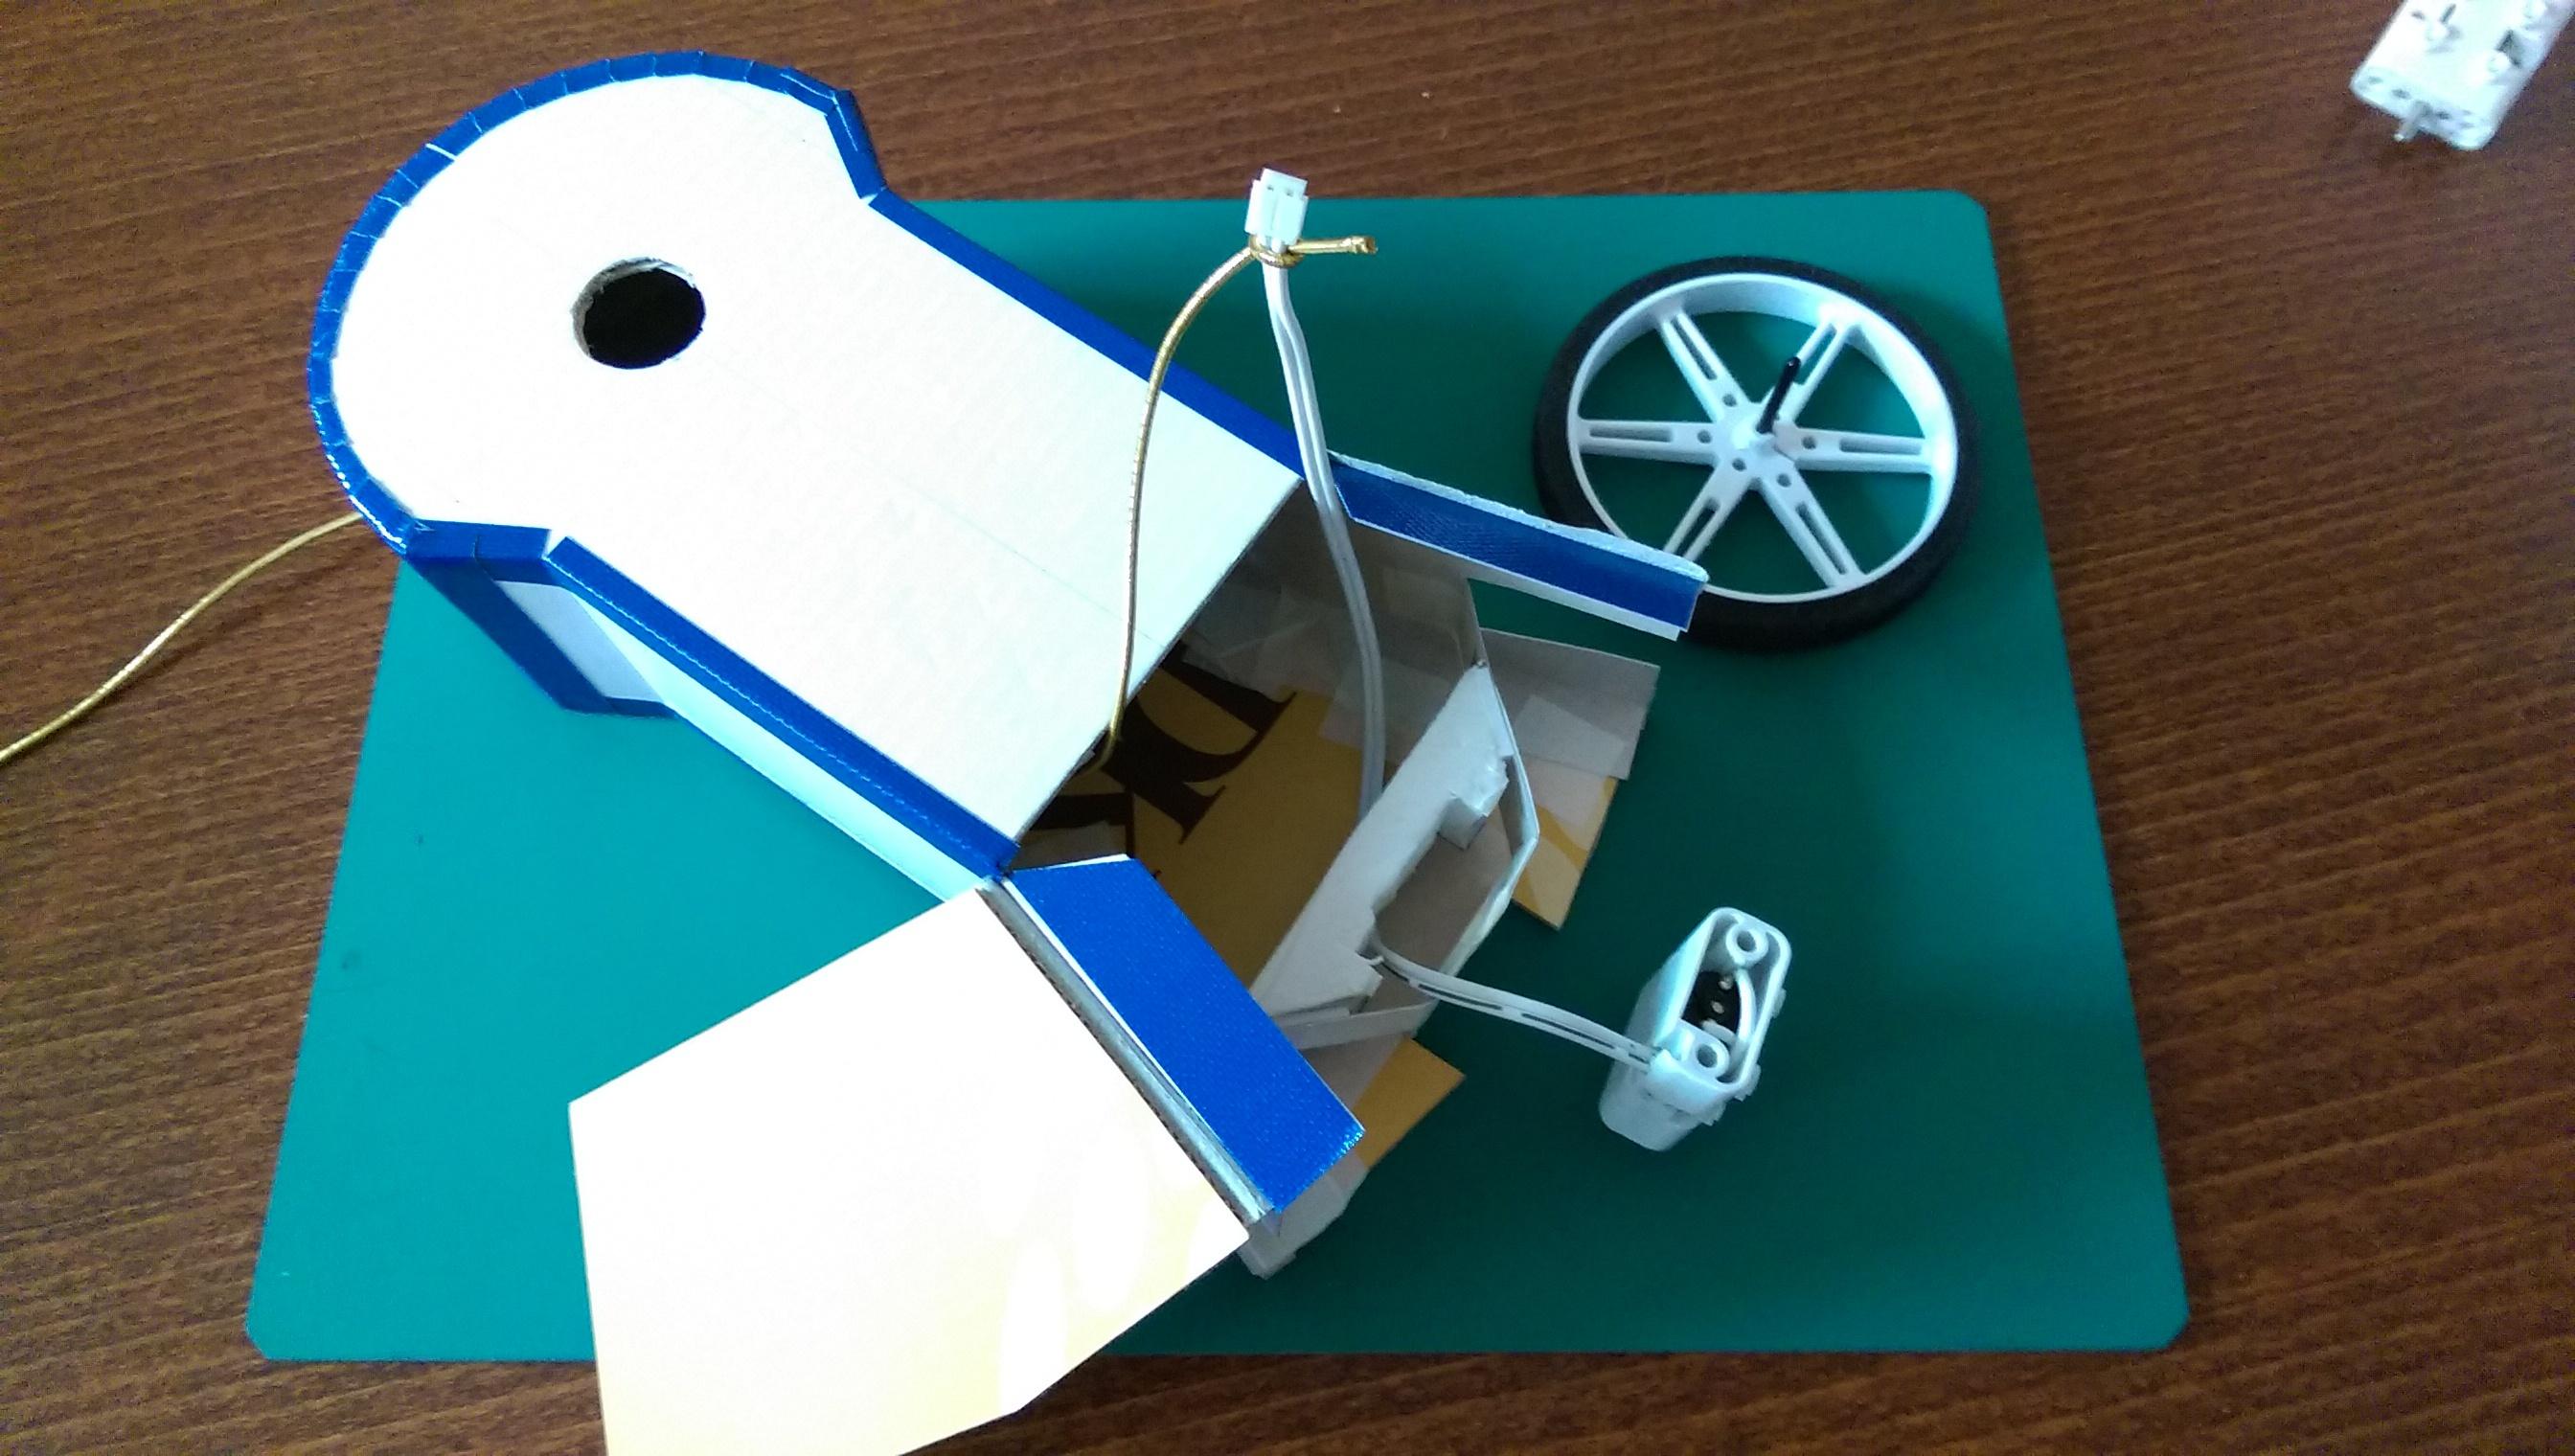 Here comes the little guy -- R2D2 #BITWARS: a littleBits